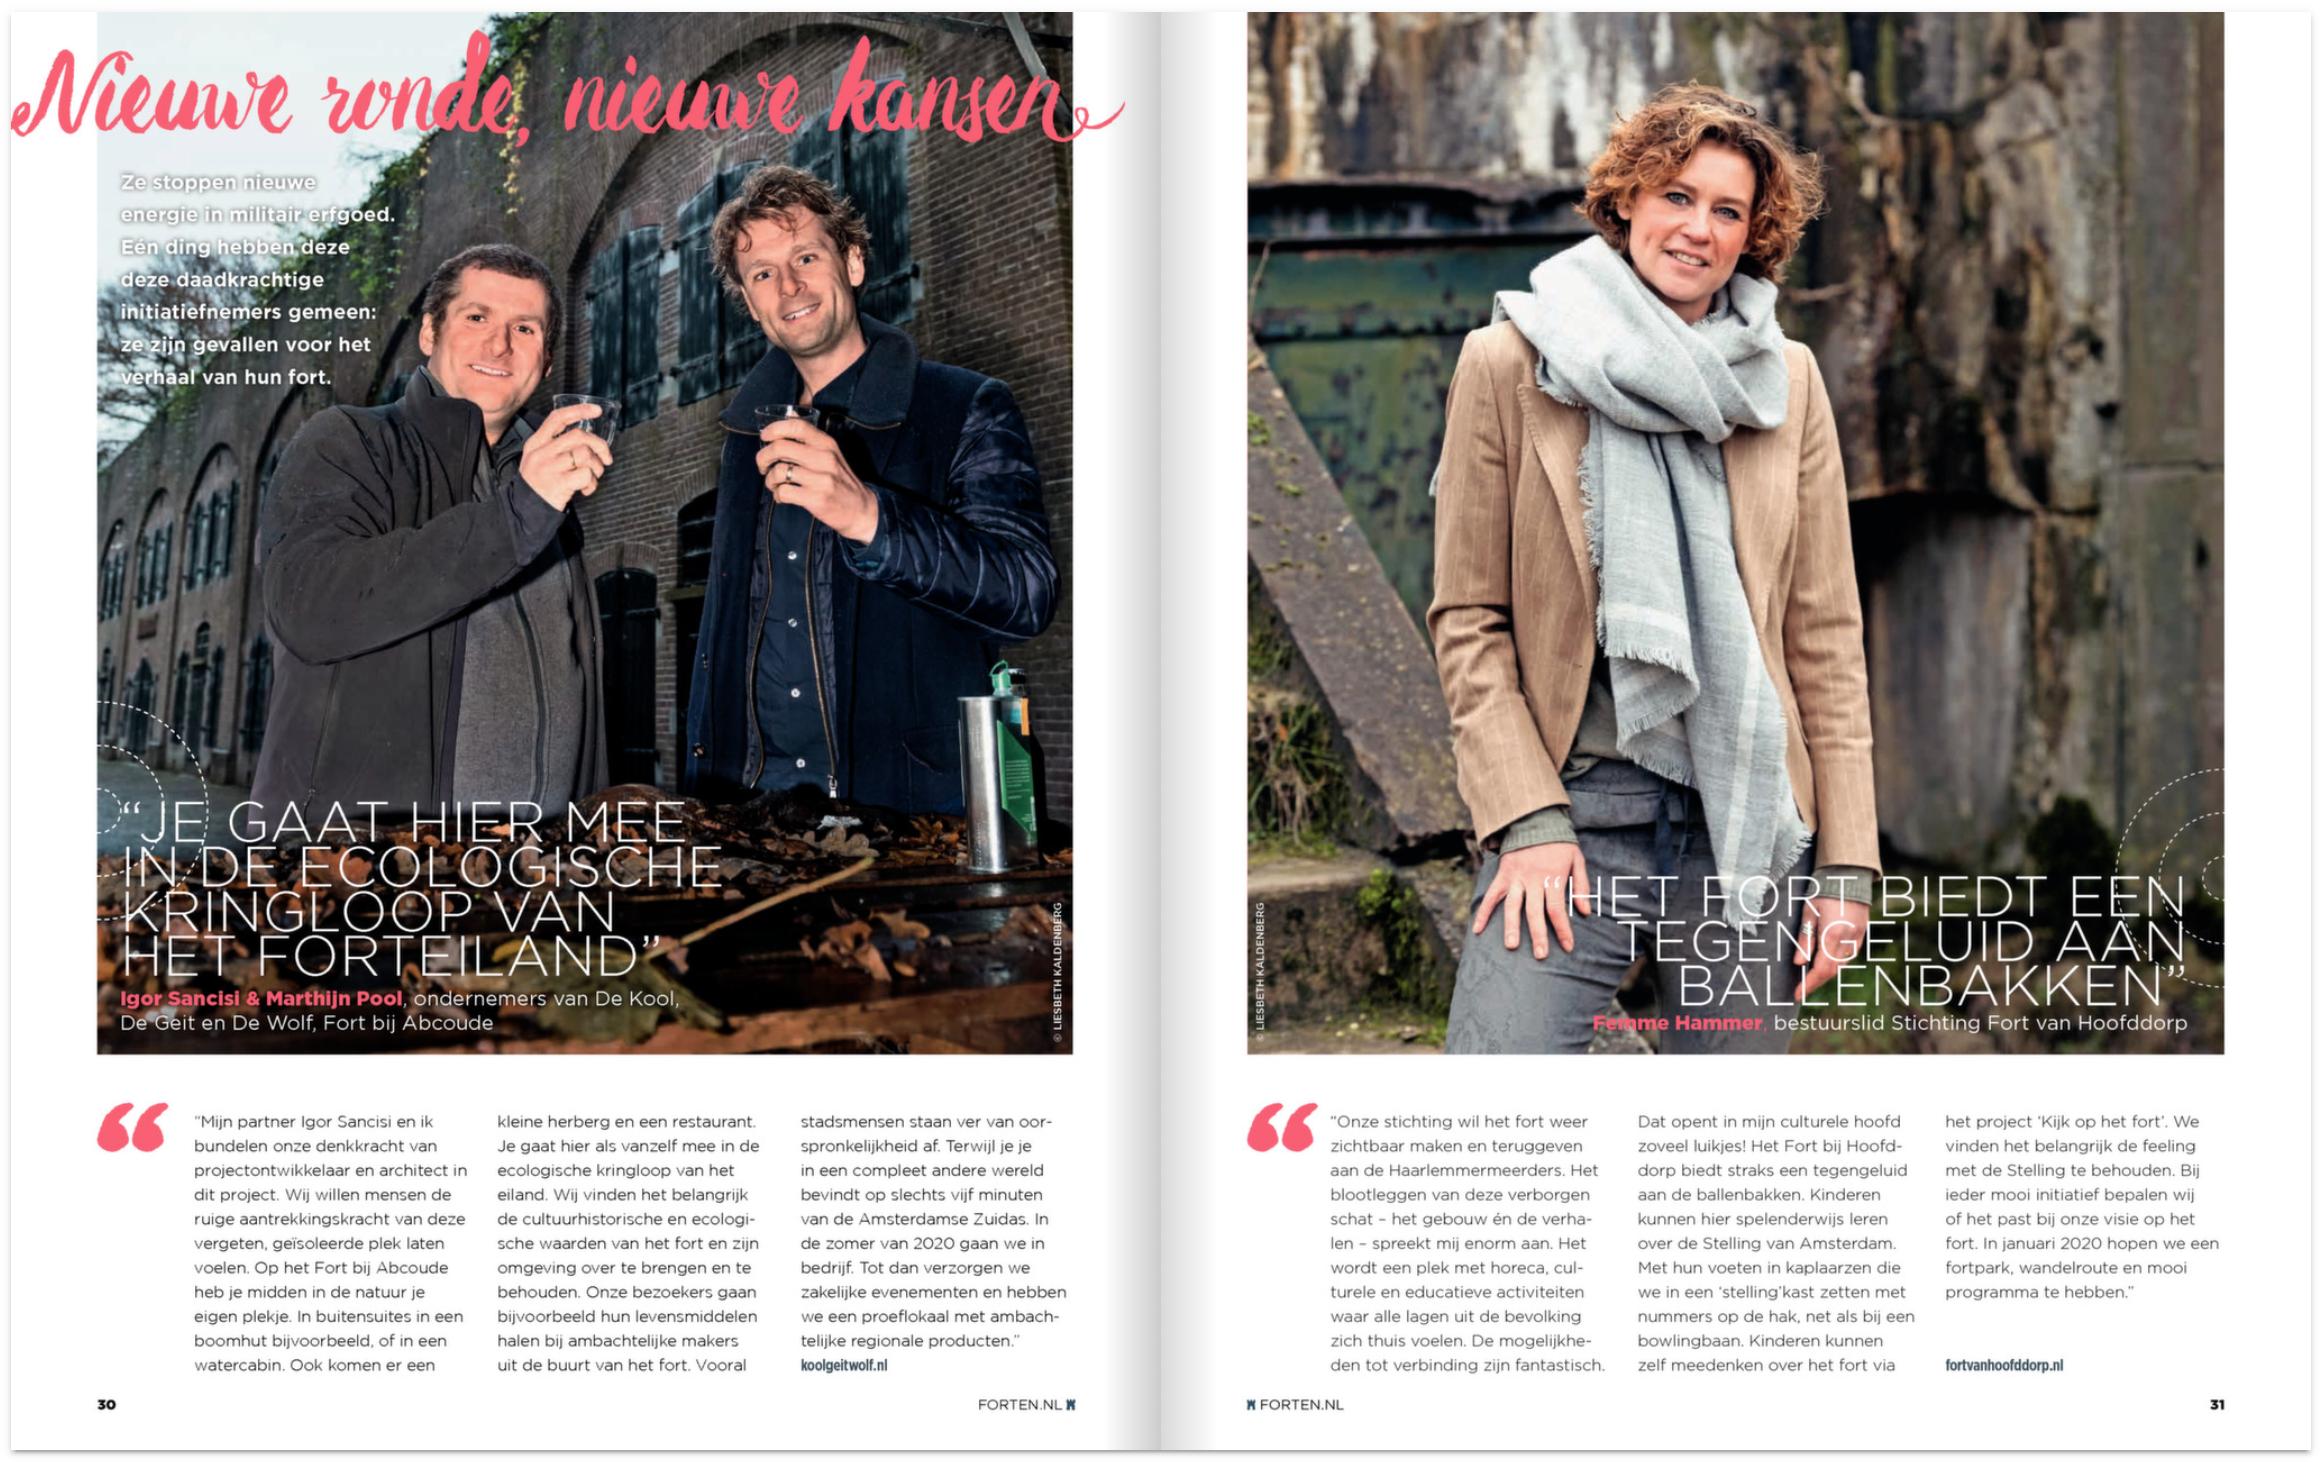 Magazine Fort 2019 Fotografie En Tekst Nummer 21 Liesbeth